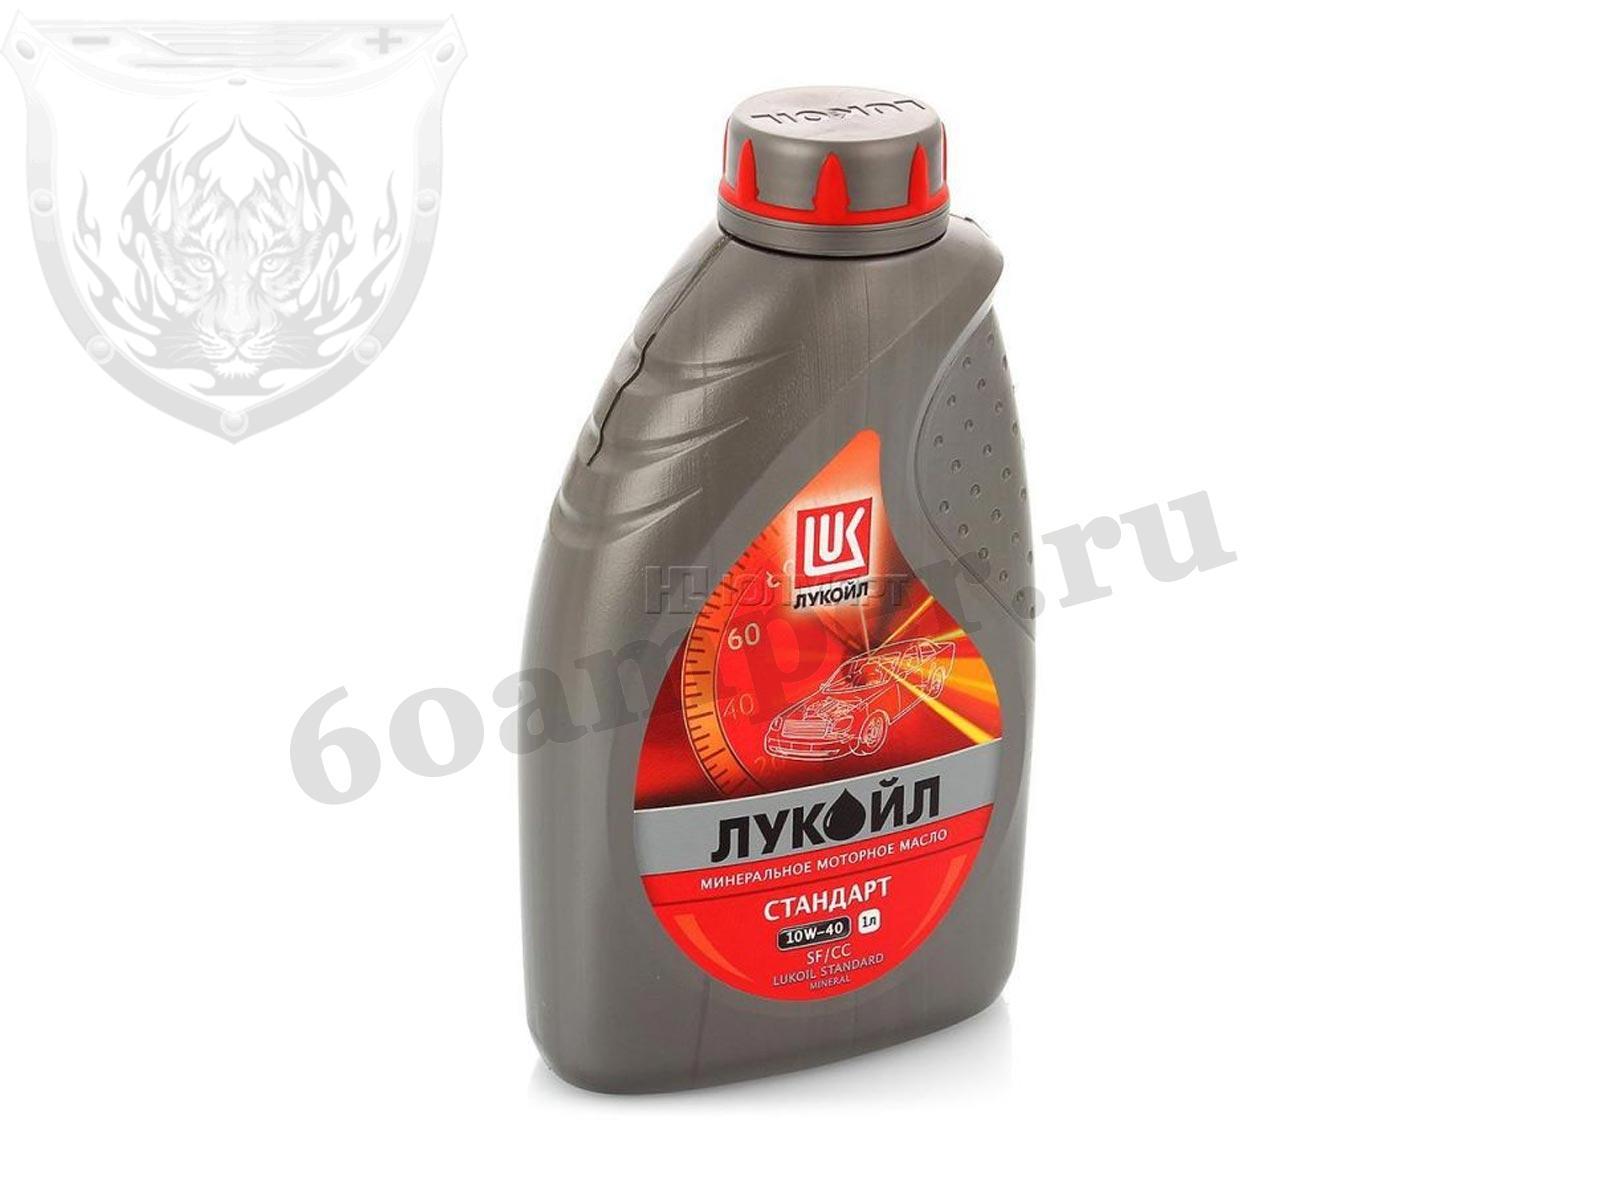 LUKOIL Стандарт 10W40 (минеральное) SF/CC (ВЕЛС-2) 1л